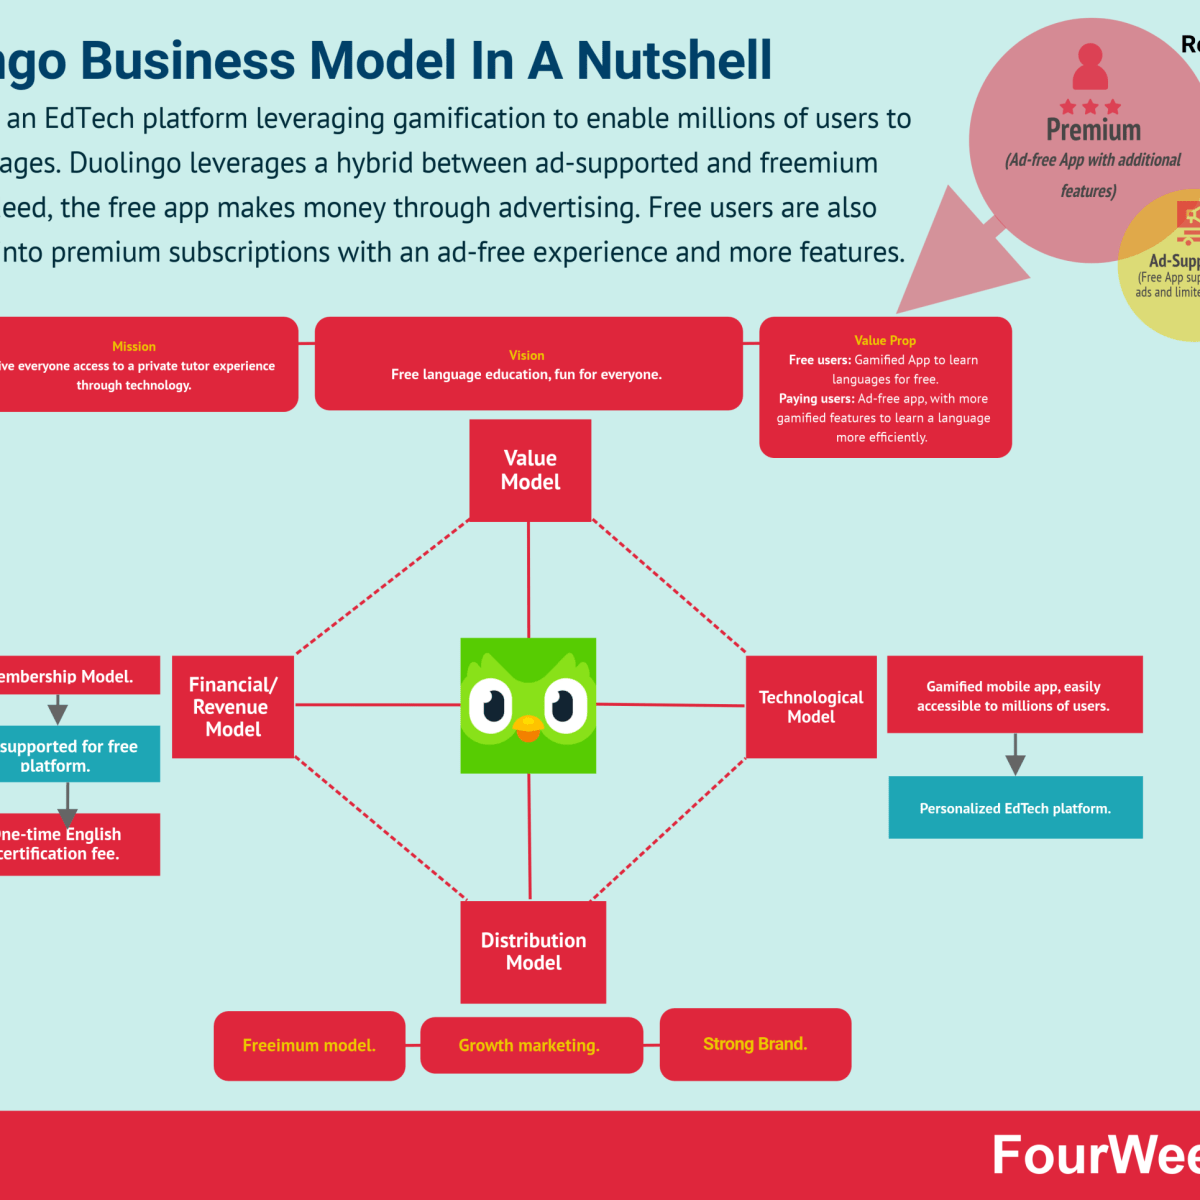 How Does Duolingo Make Money? Duolingo Business Model In A Nutshell